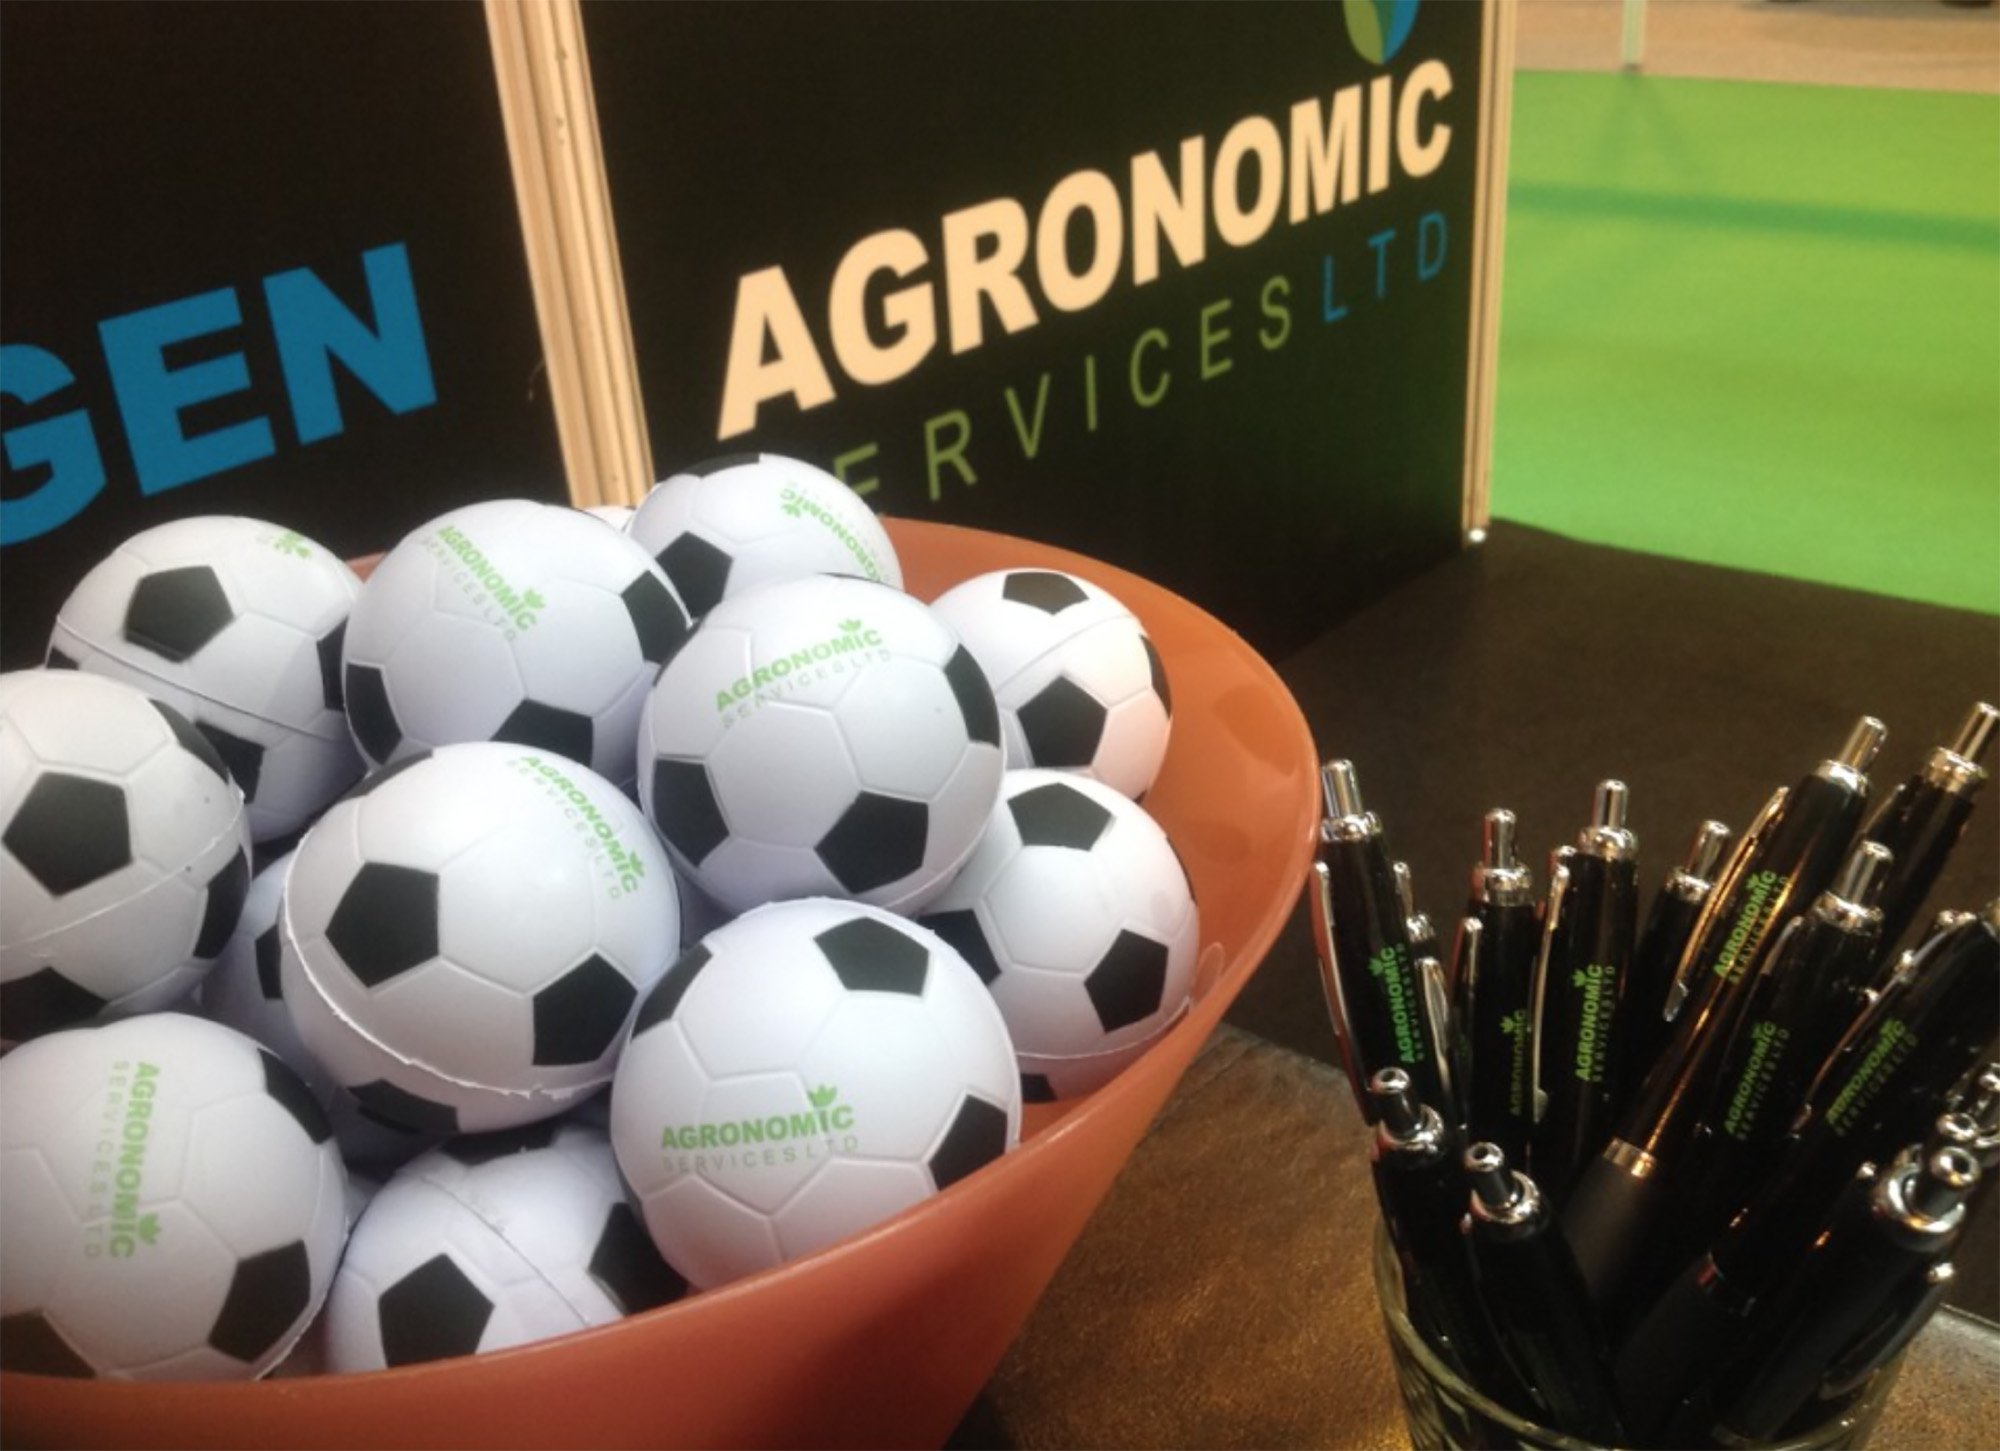 agronomics Επιστημονική αεροχαρτογράφηση αμπελώνων η υπηρεσία droneagronomics της melioreuropa παρέχει τη.